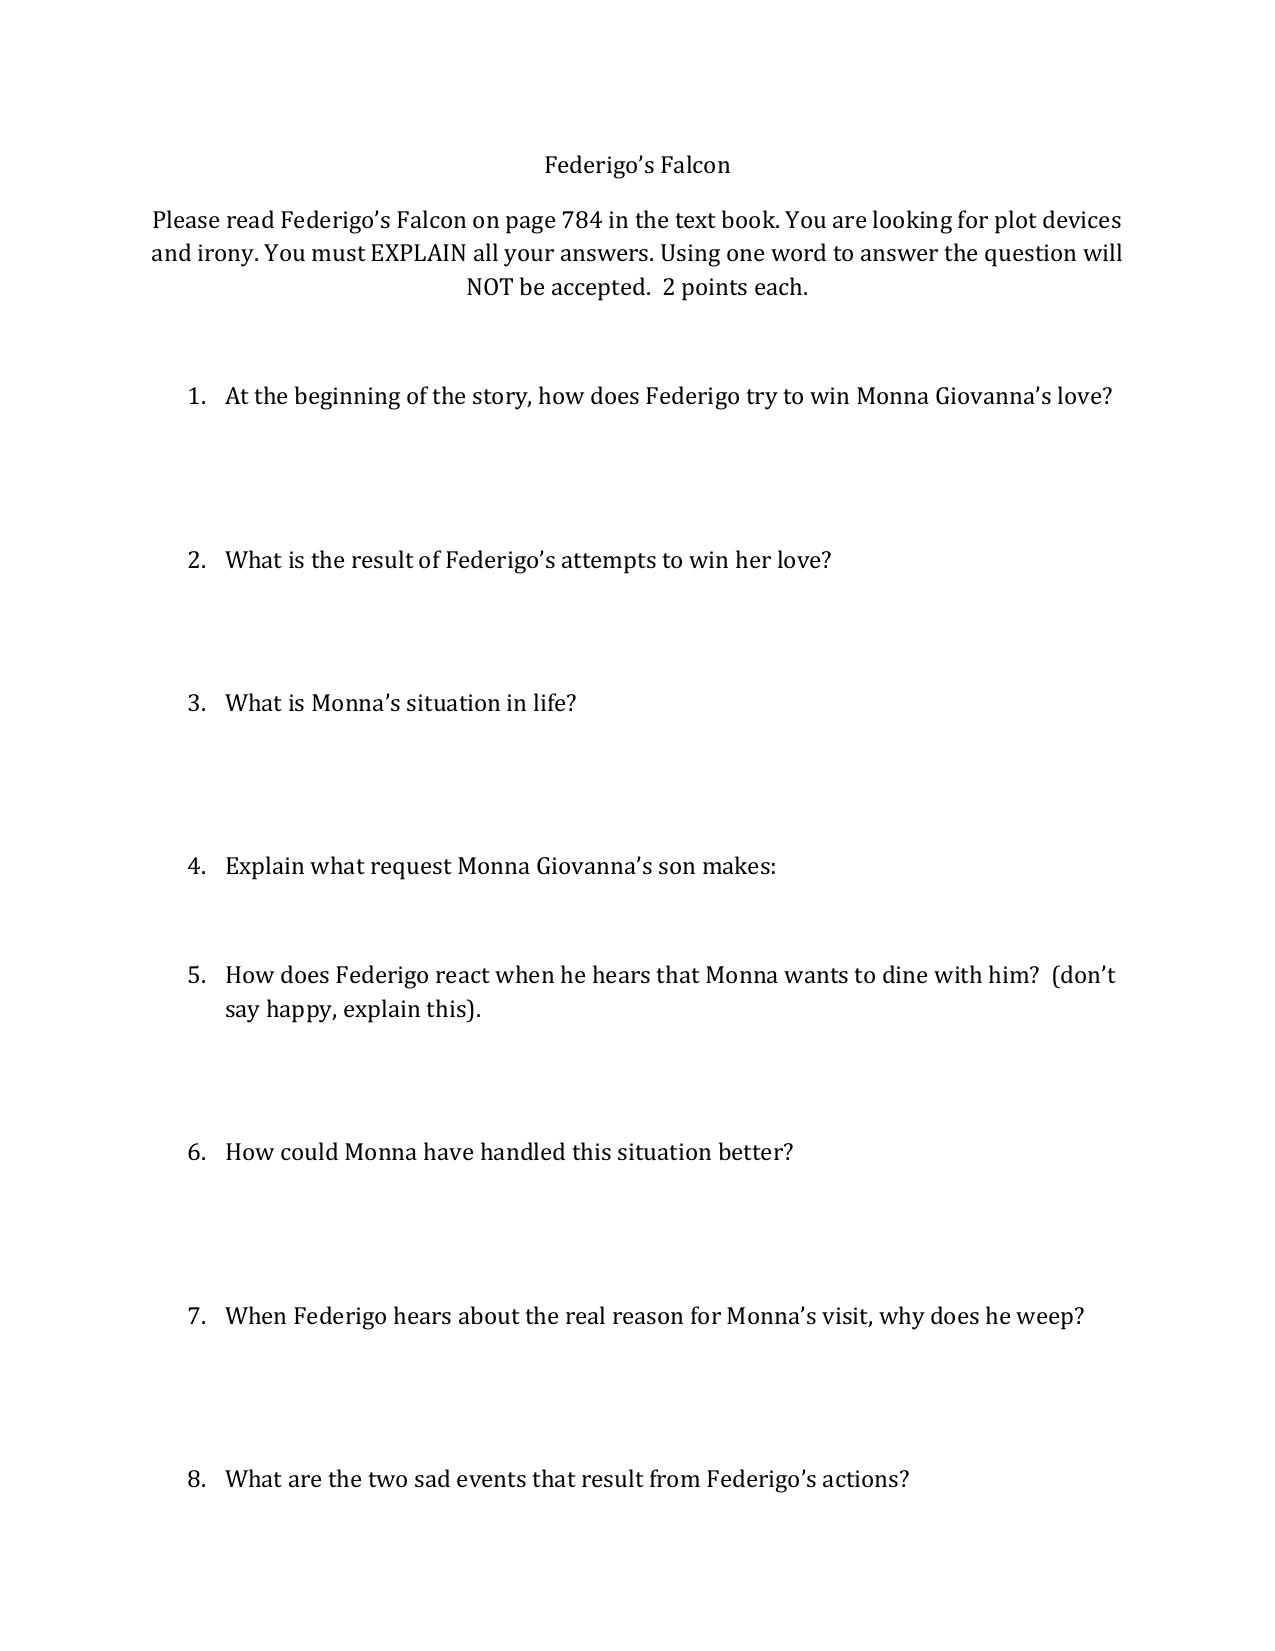 federigos falcon essay topics